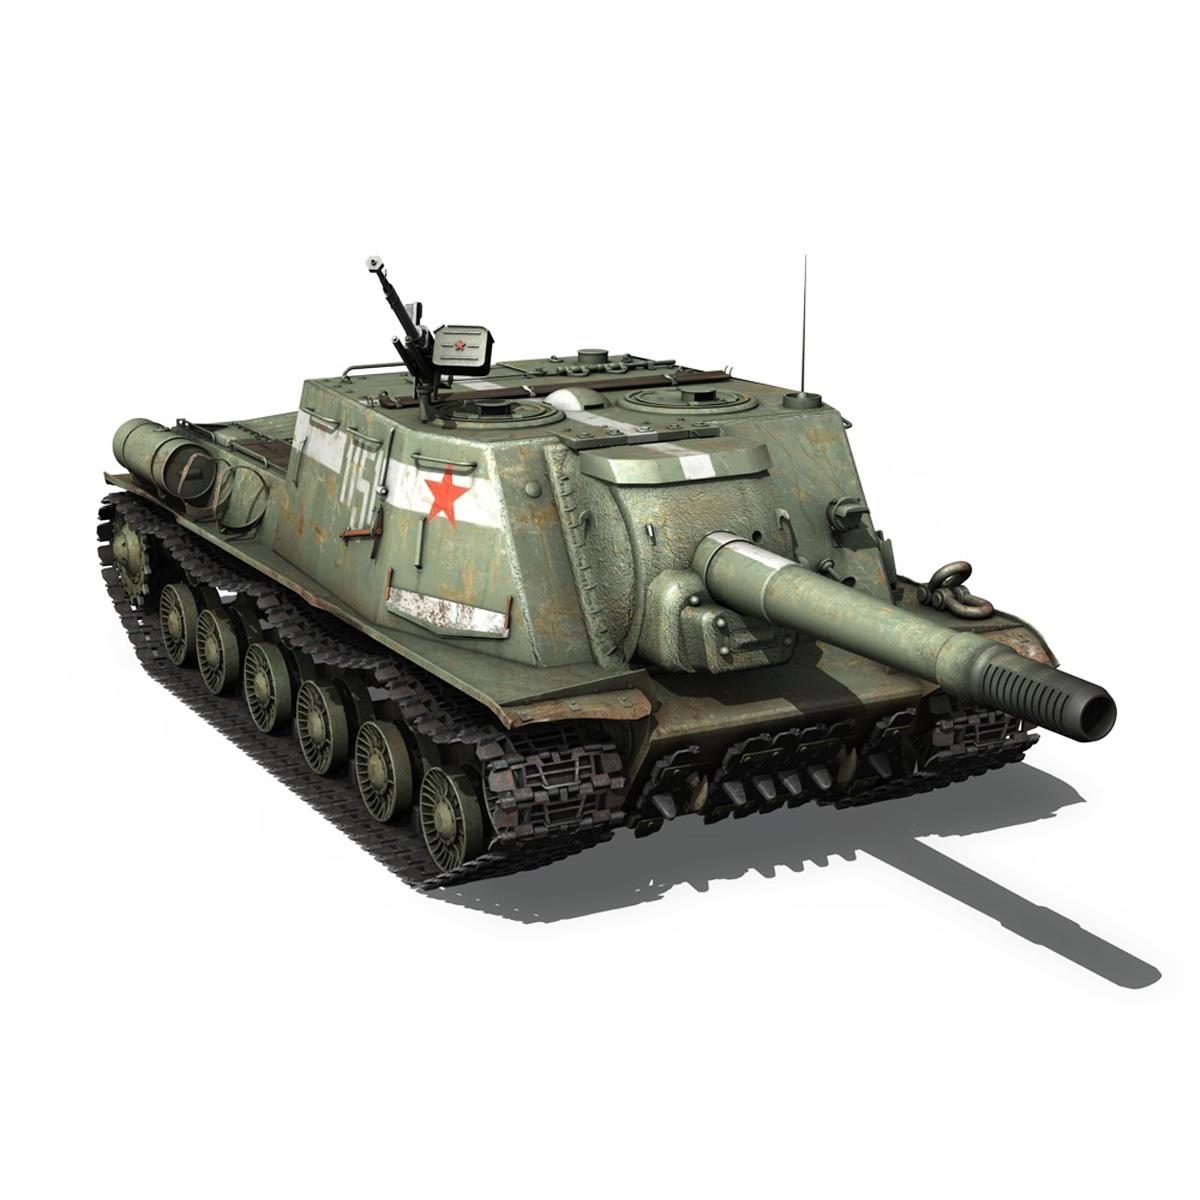 isu 152 soviet heavy self propelled gun 3d model 3ds fbx c4d lwo obj 187531